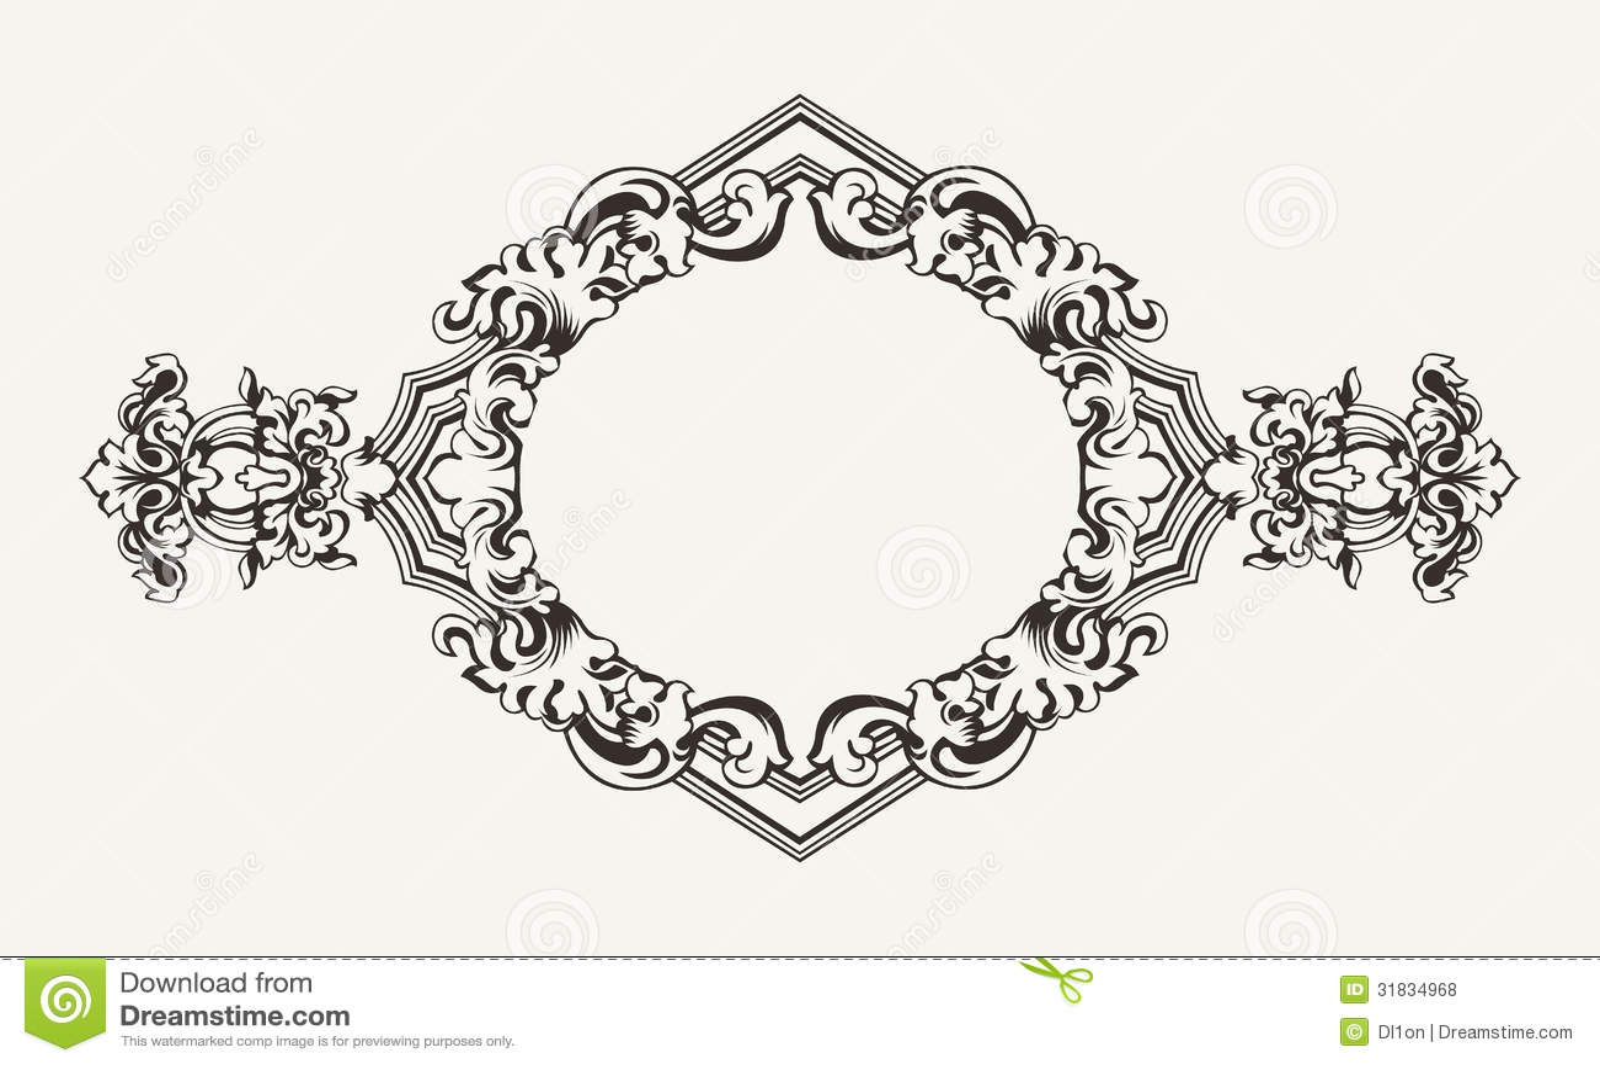 High Ornate Rhombus Frame Royalty Free Stock Photos